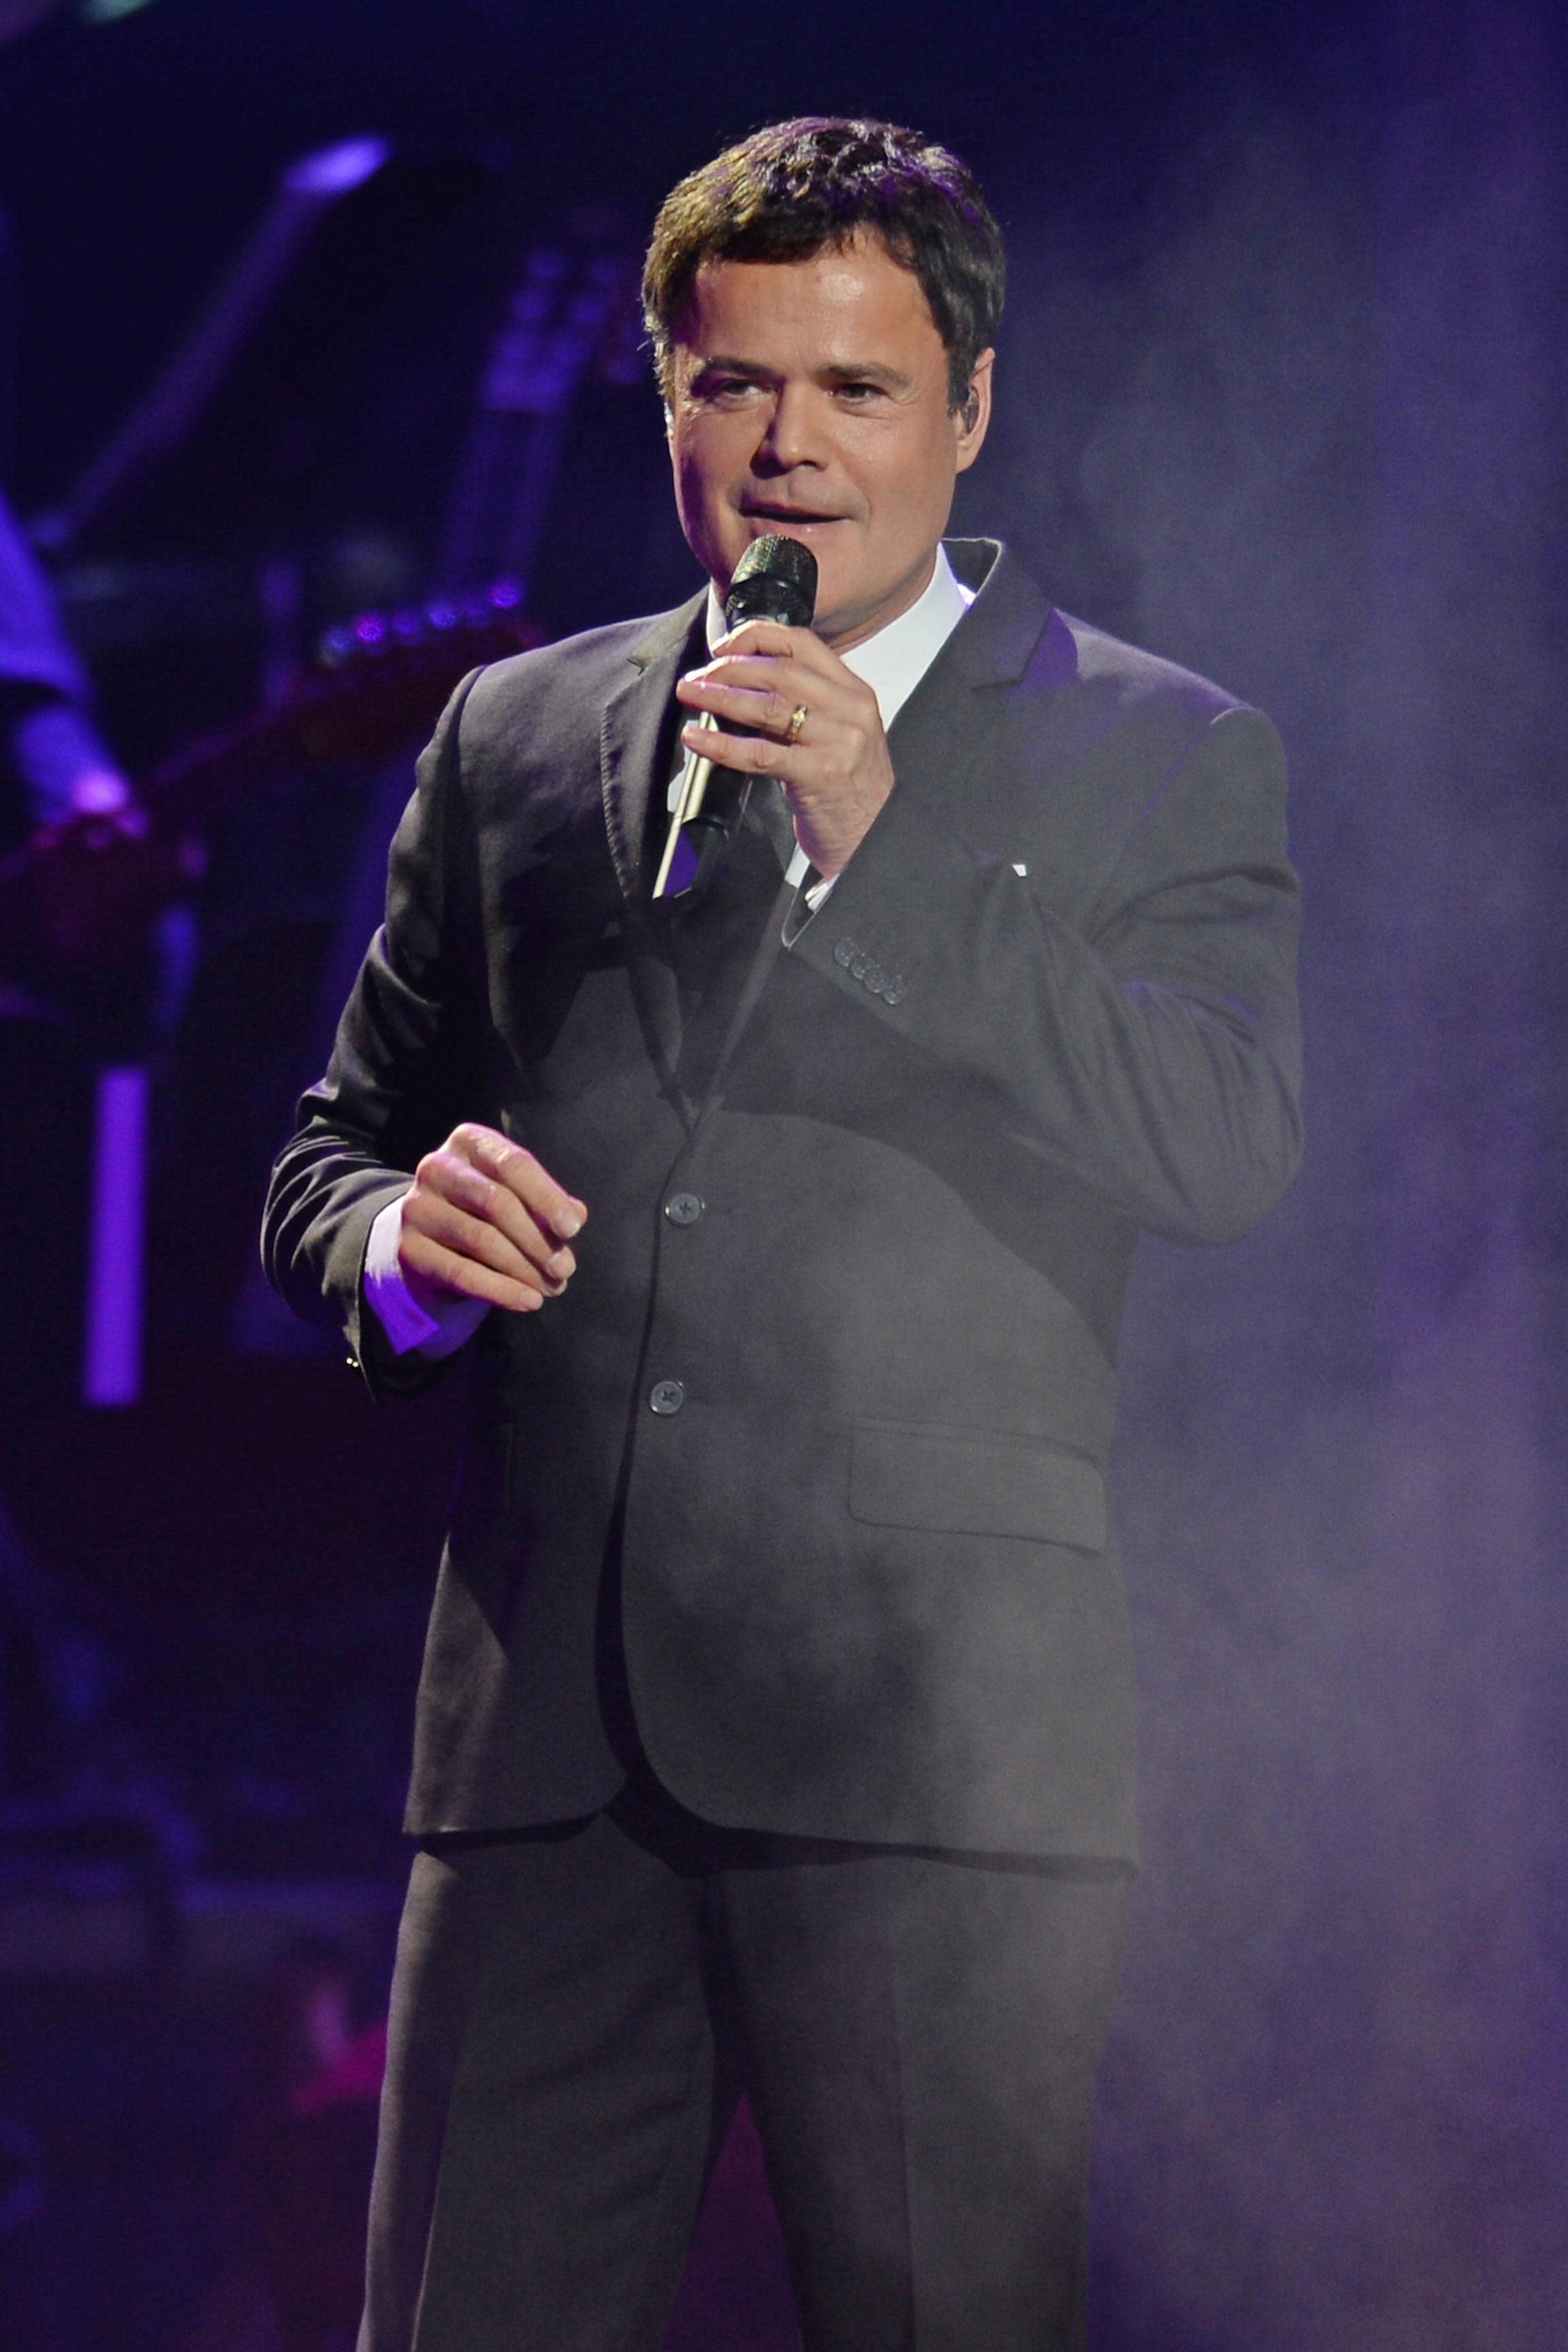 Donny Osmond To Undergo Vocal Cord Surgery